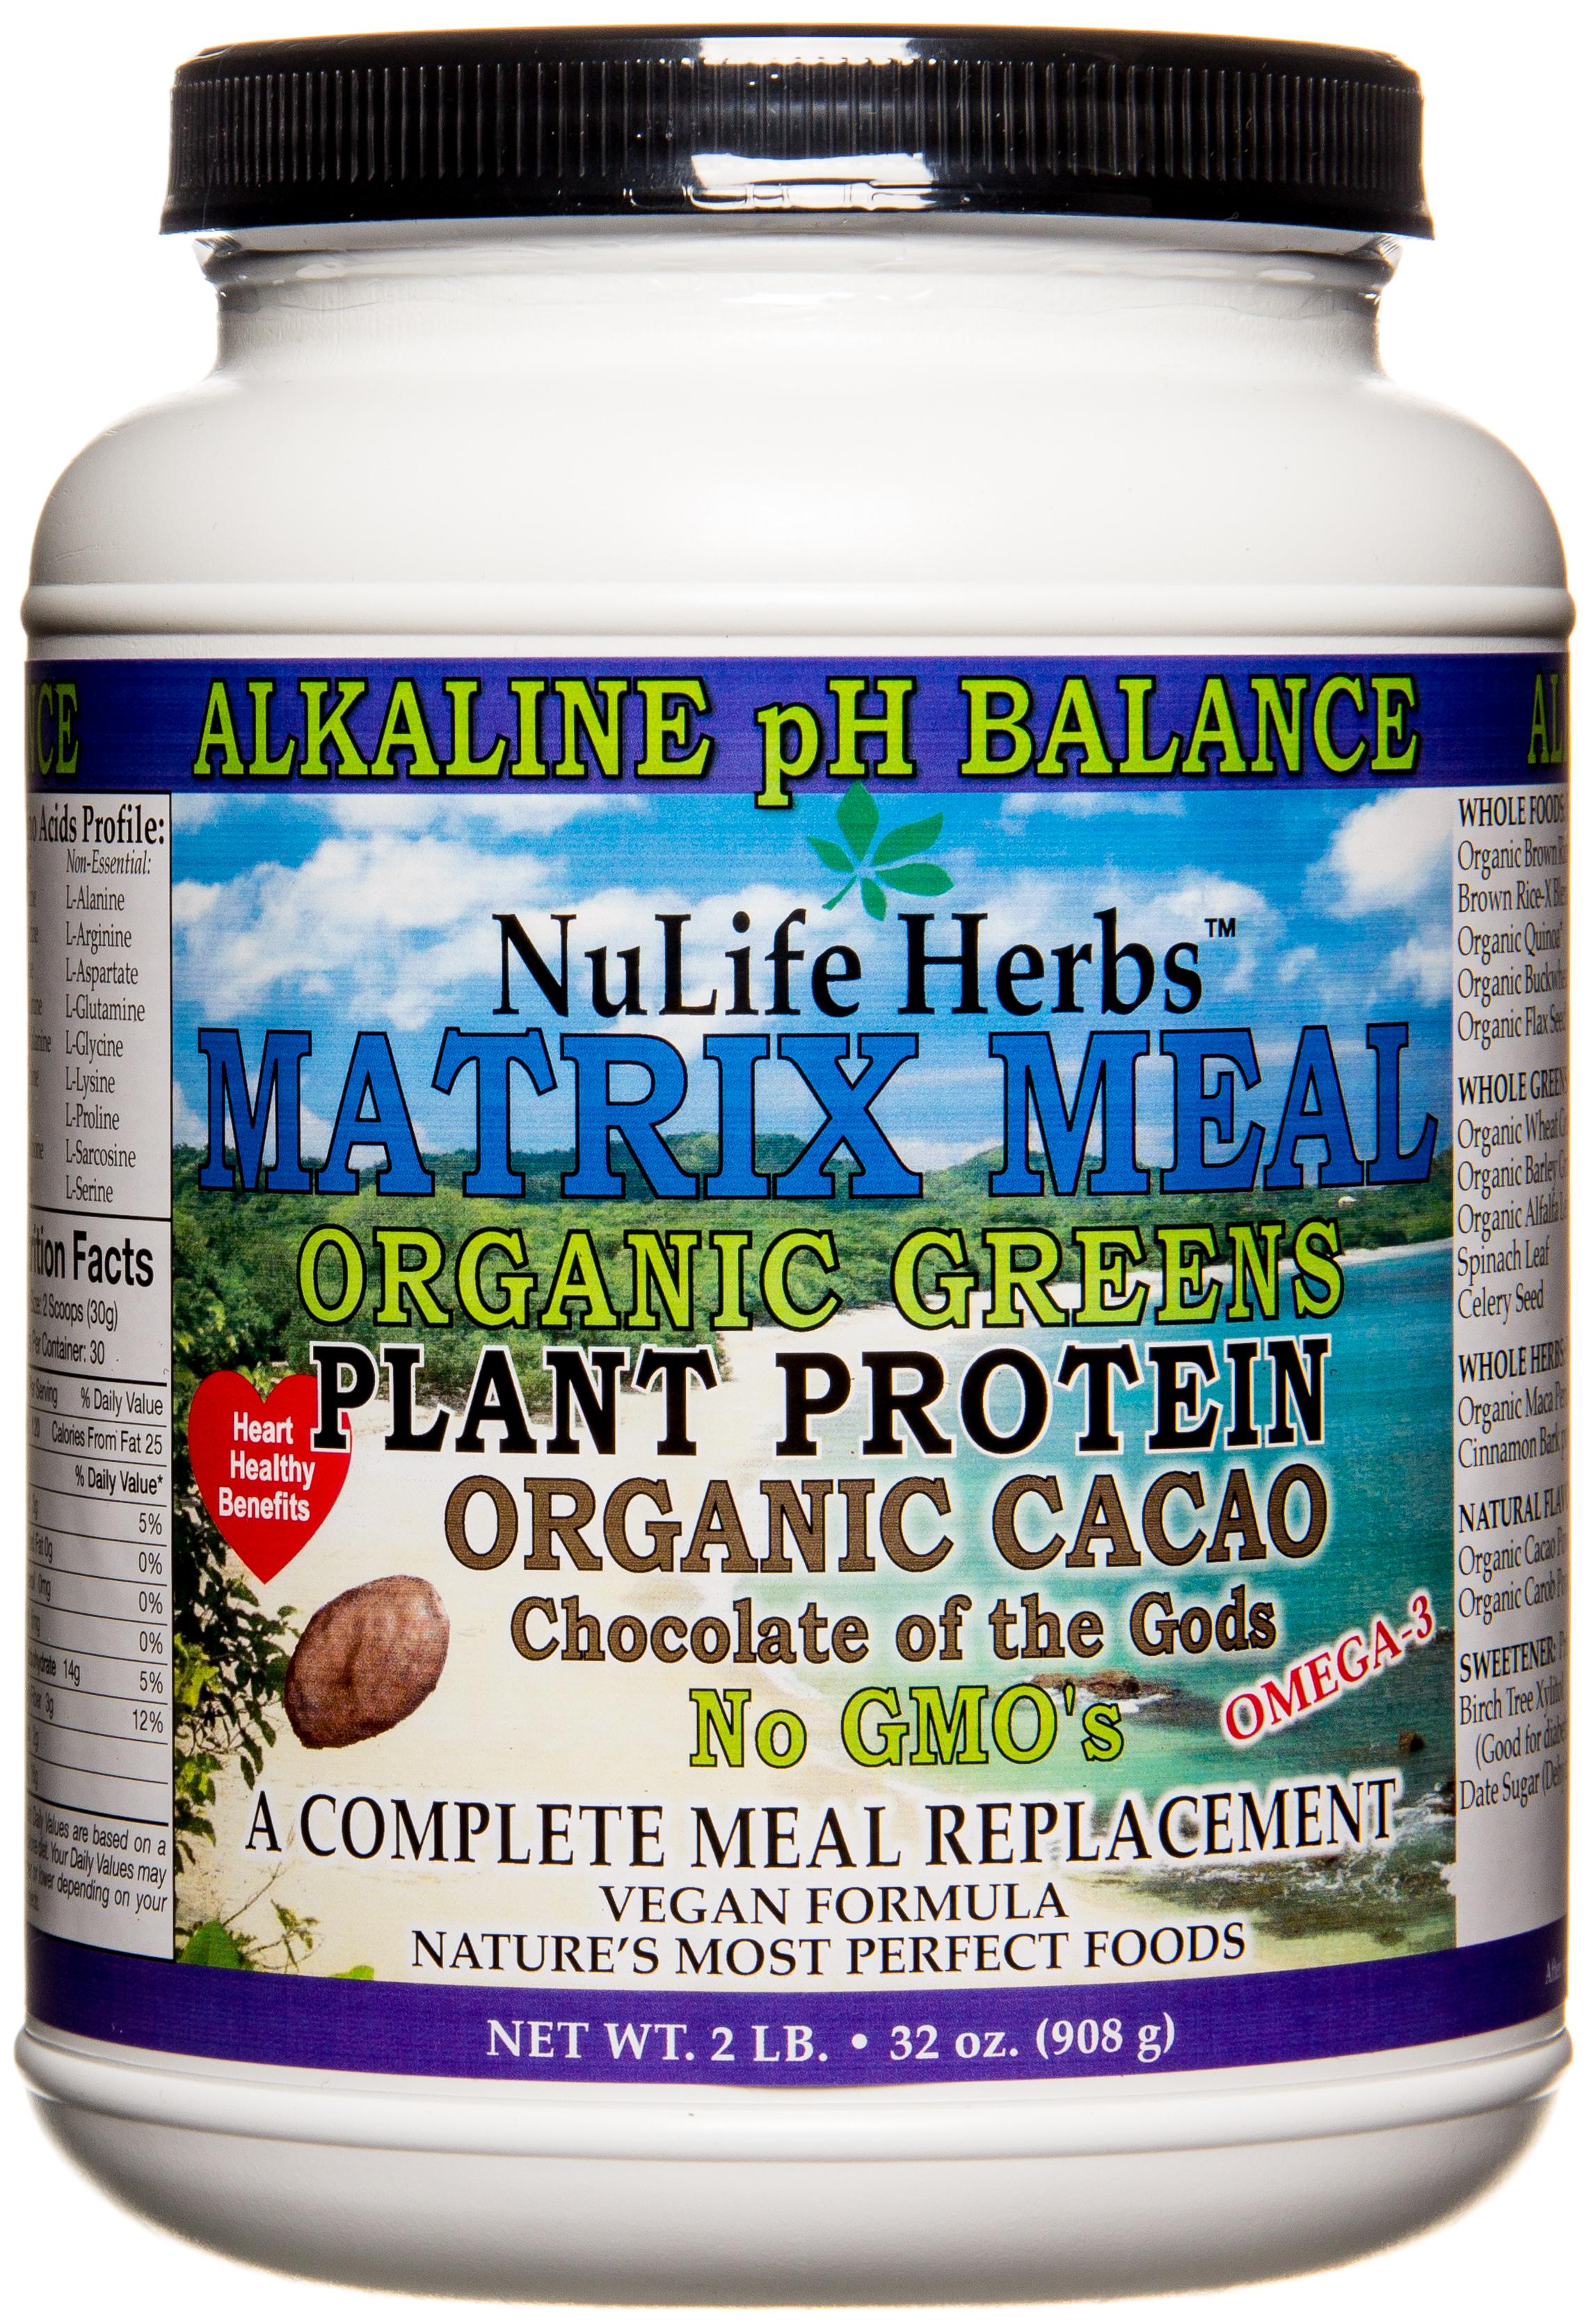 NuLife Herbs Inc